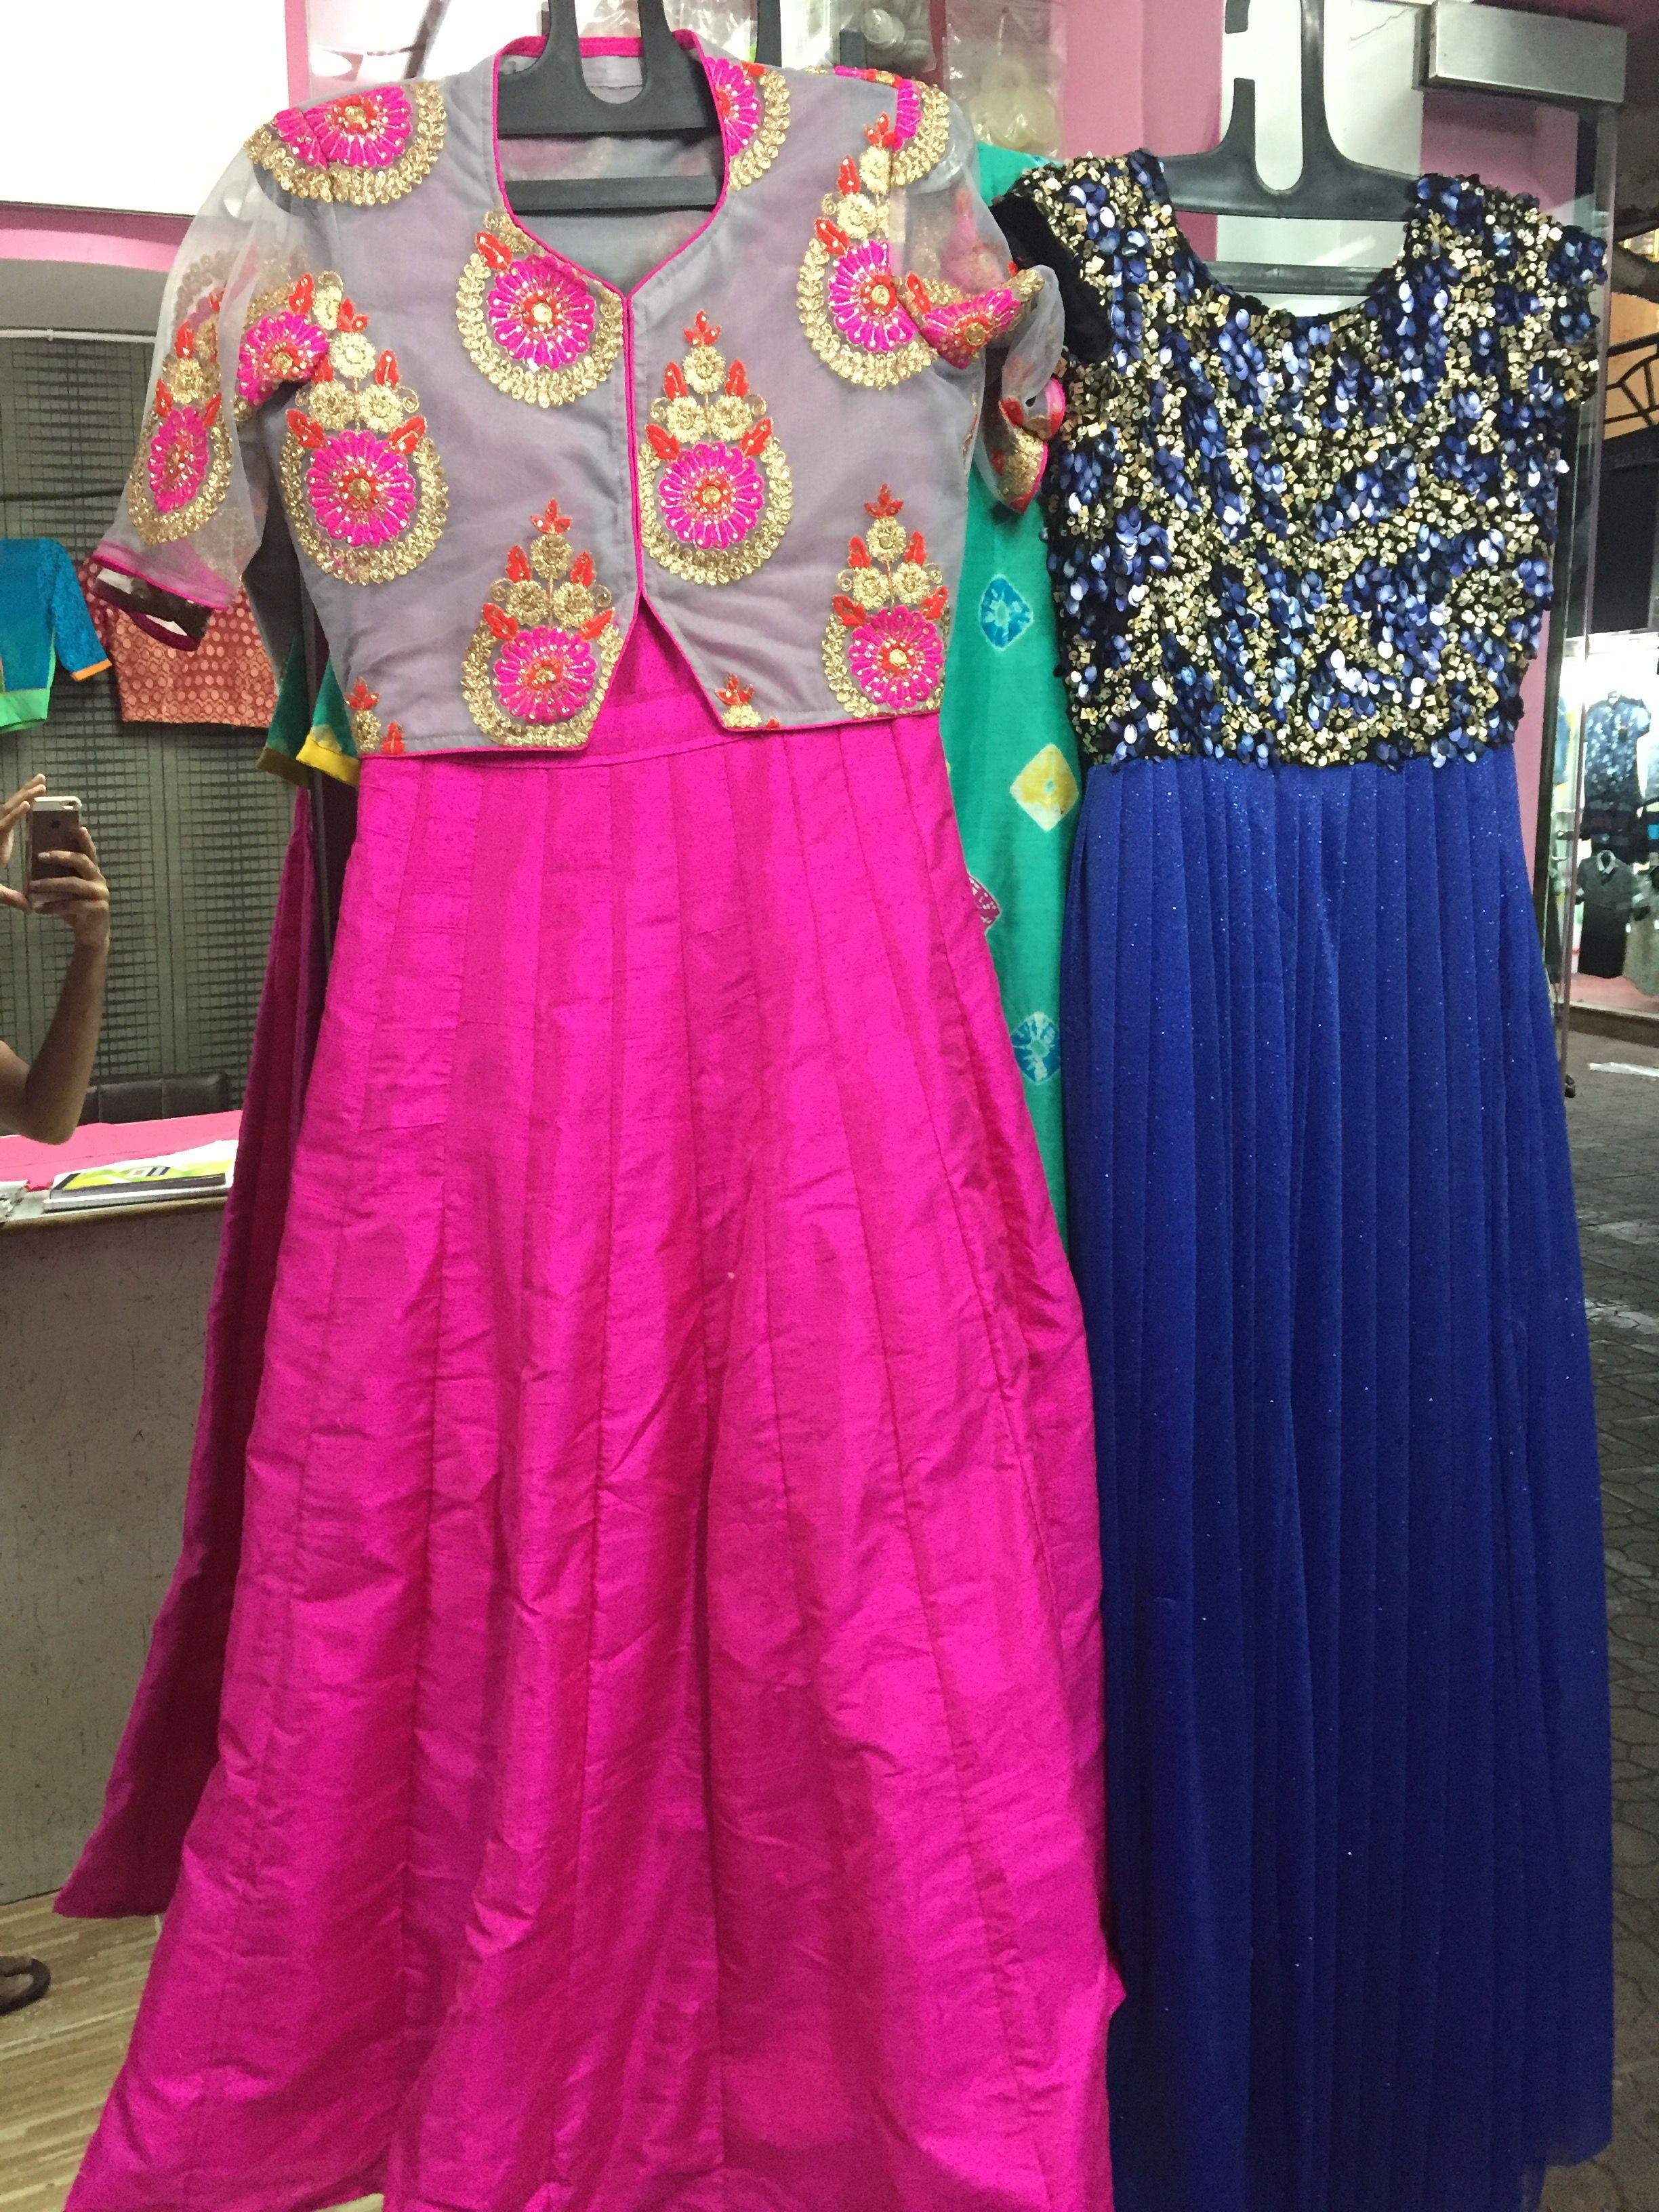 Fashion boutique in india 89